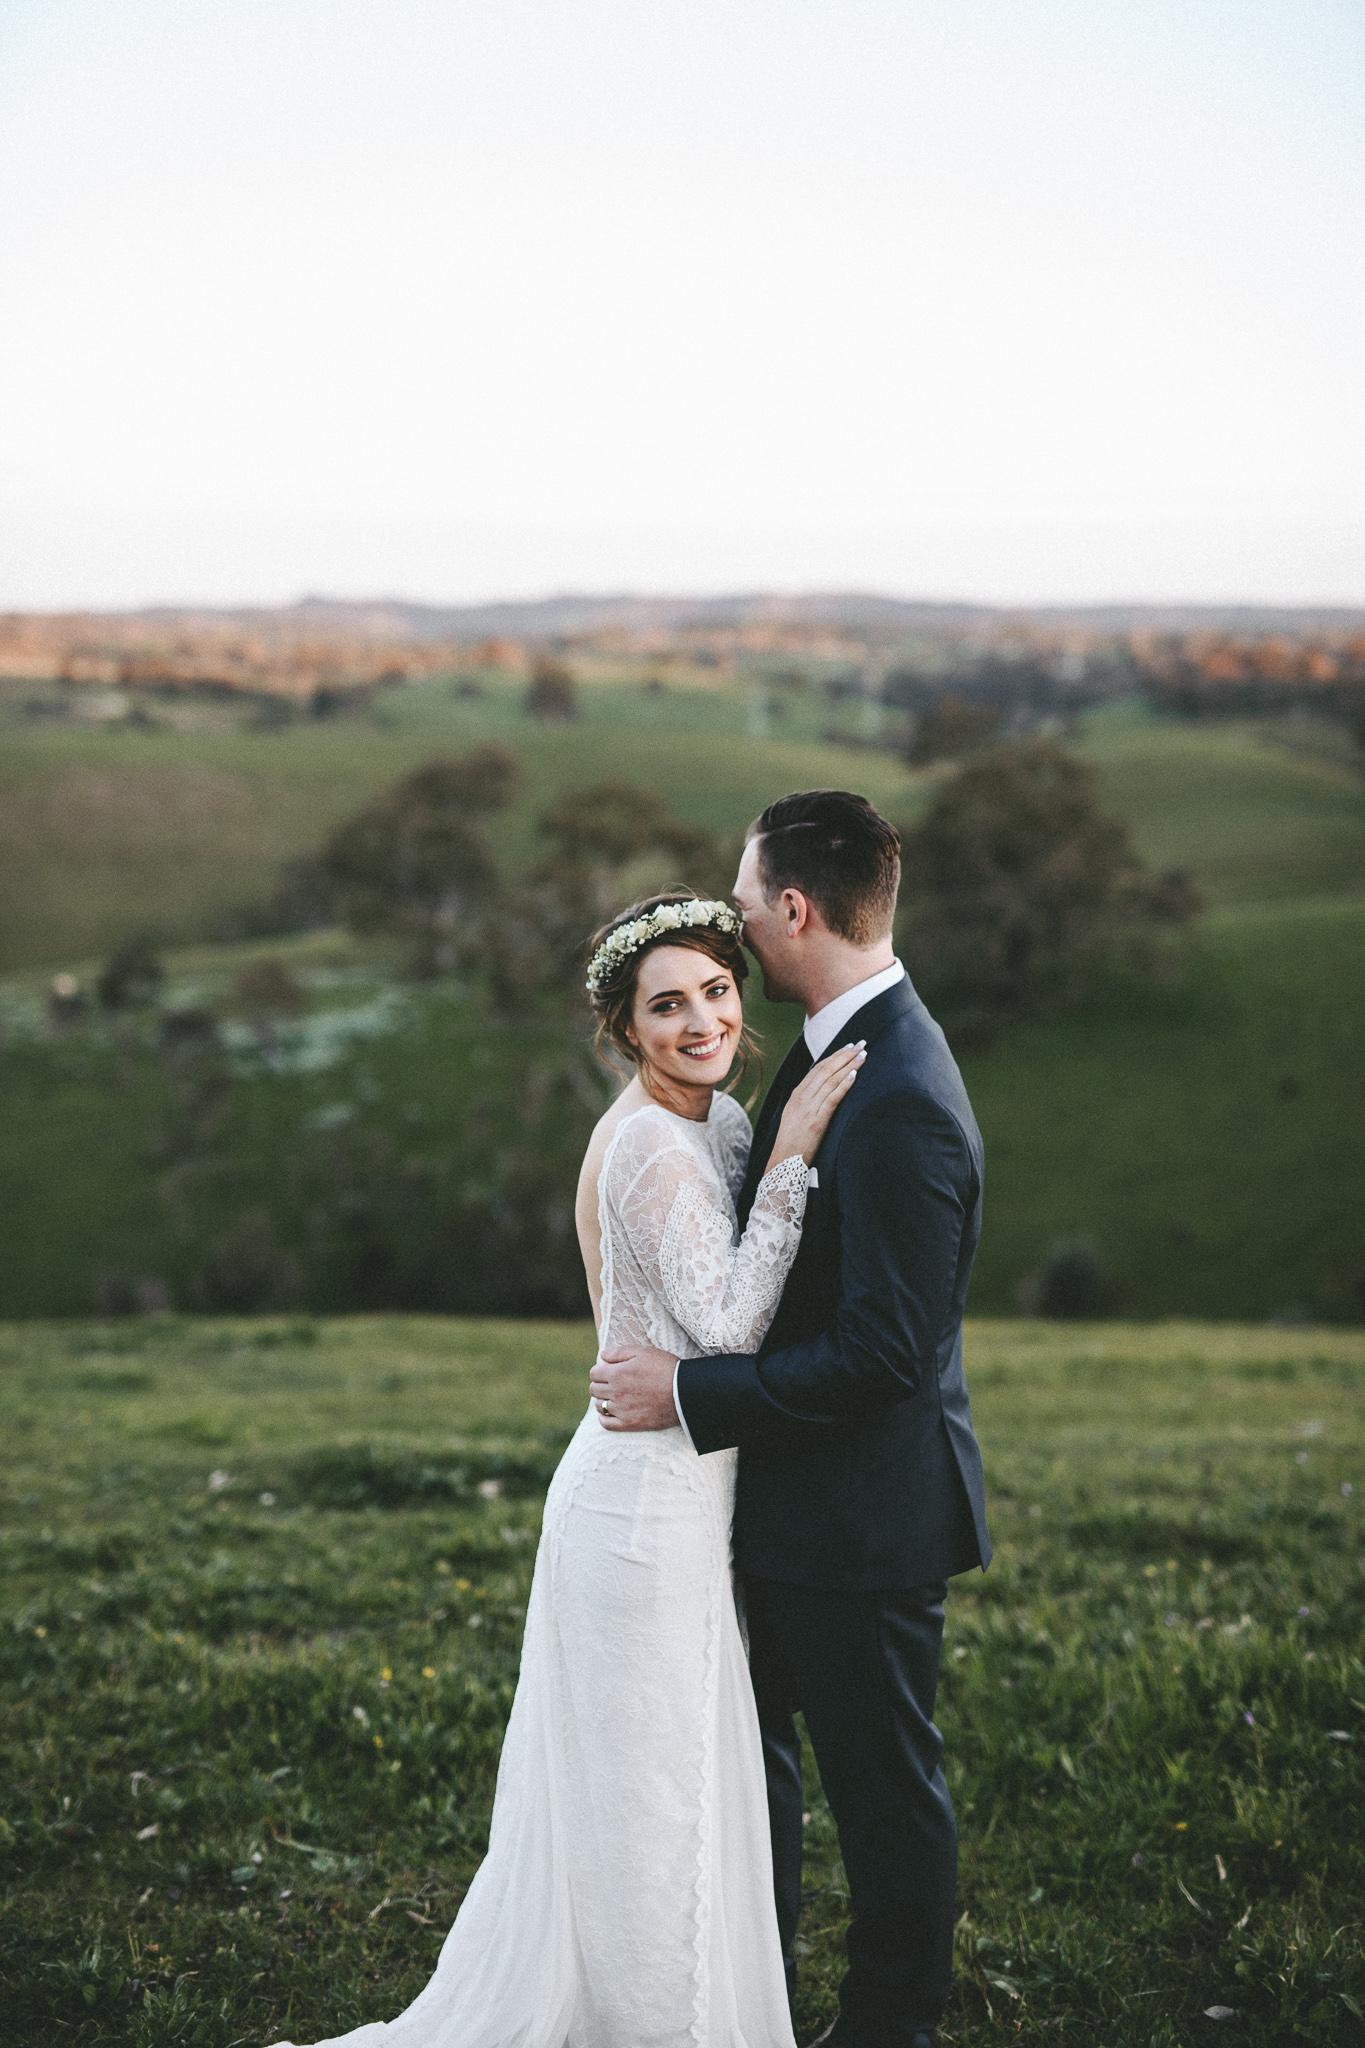 christopher morrison_adelaide hills wedding_ andy + teegan_88_1079.jpg